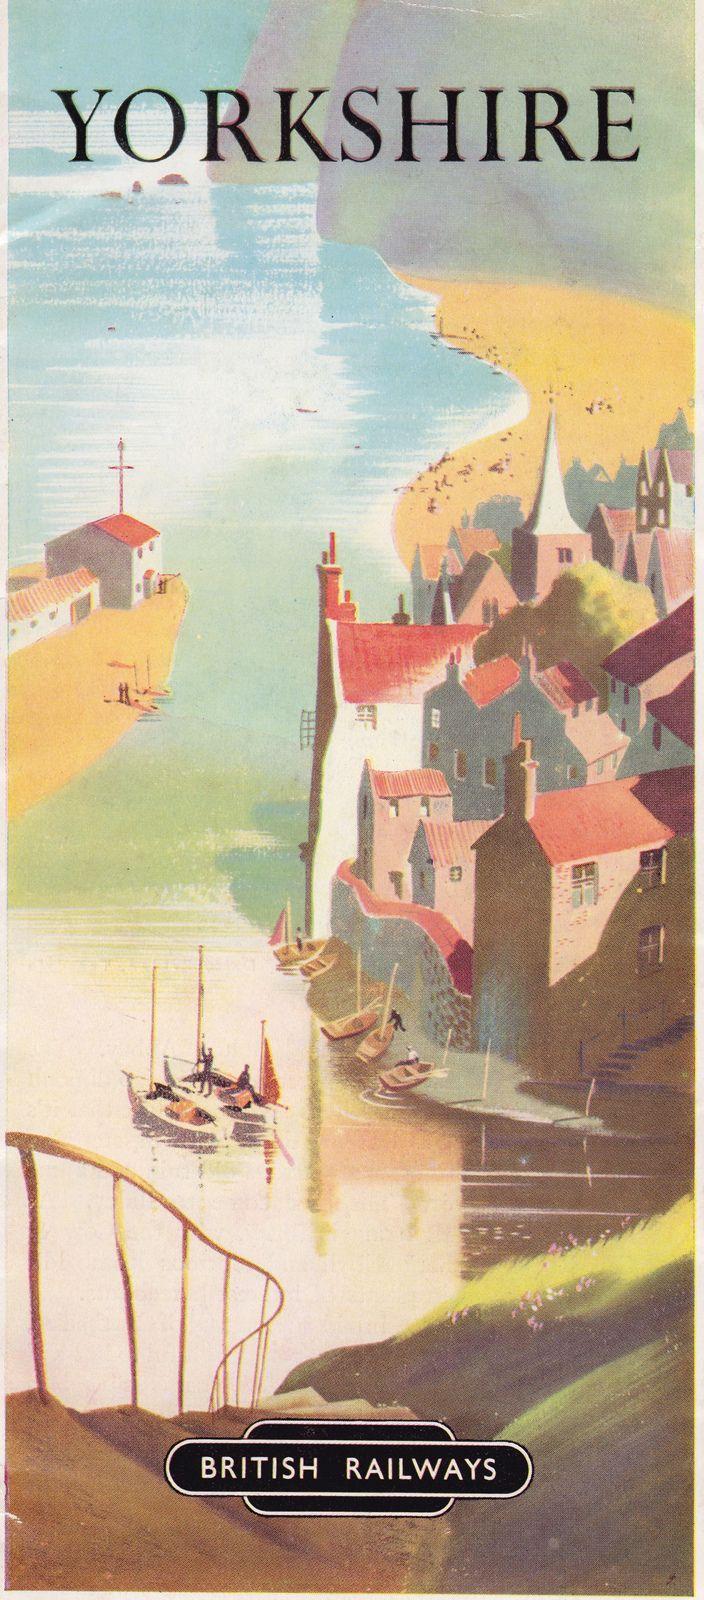 U.K. Yorkshire. Holiday guide brochure issued by British Railways, 1952 / by mickeyashworth via flickr